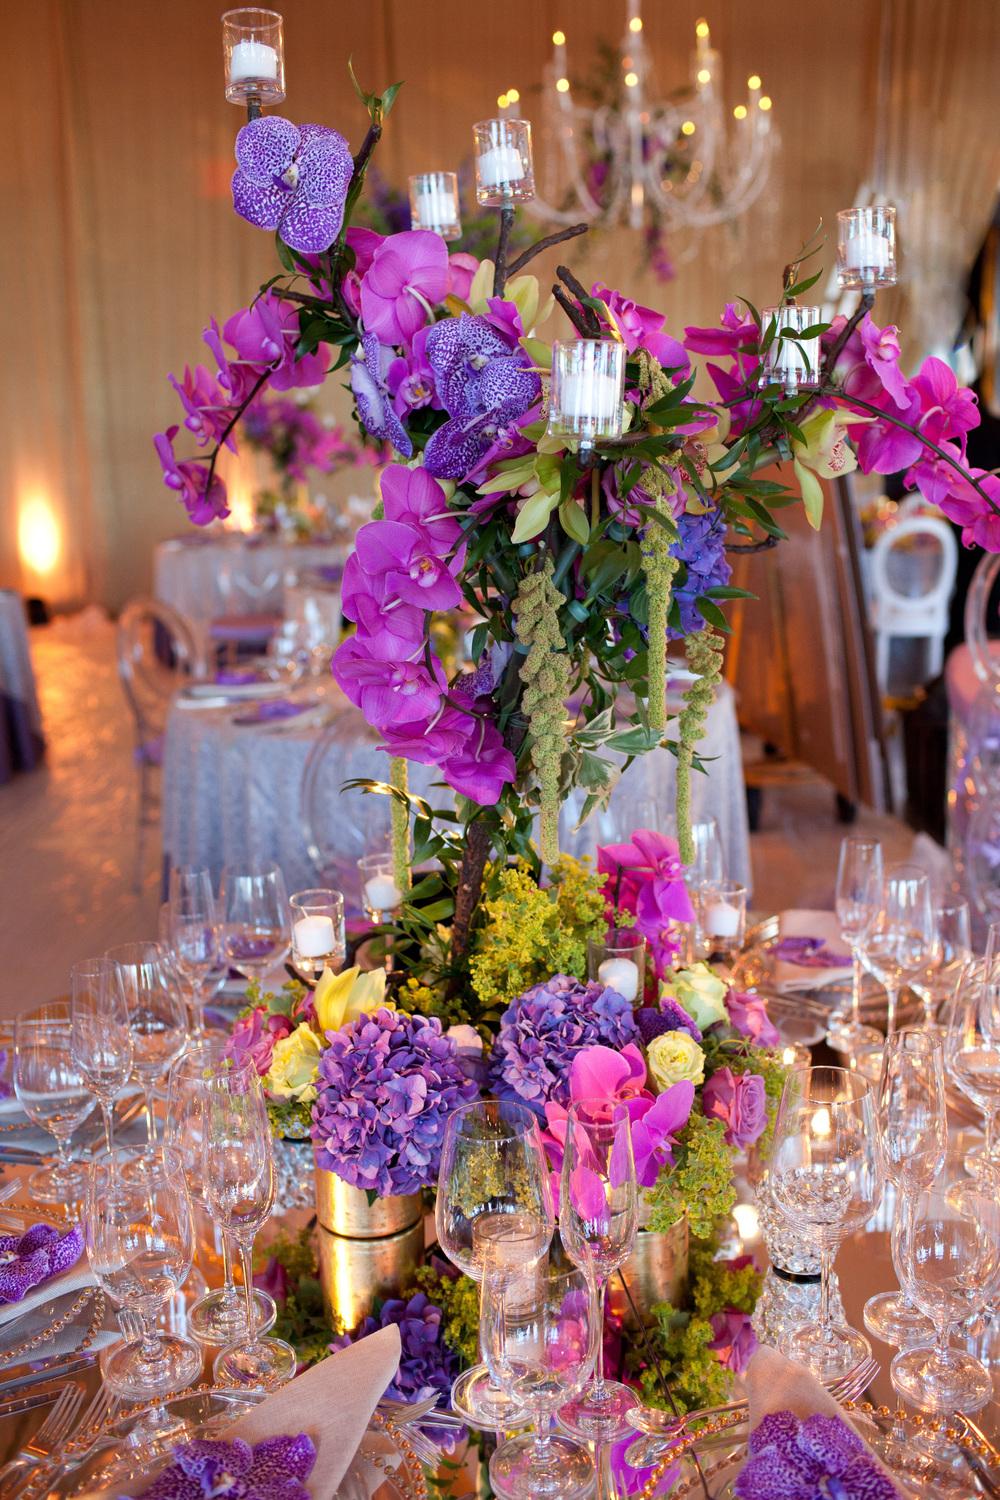 mandarin_oriental_new_york_city_branding_inspiration_lavender_silver_wedding_floral_purple_v284_36.jpg